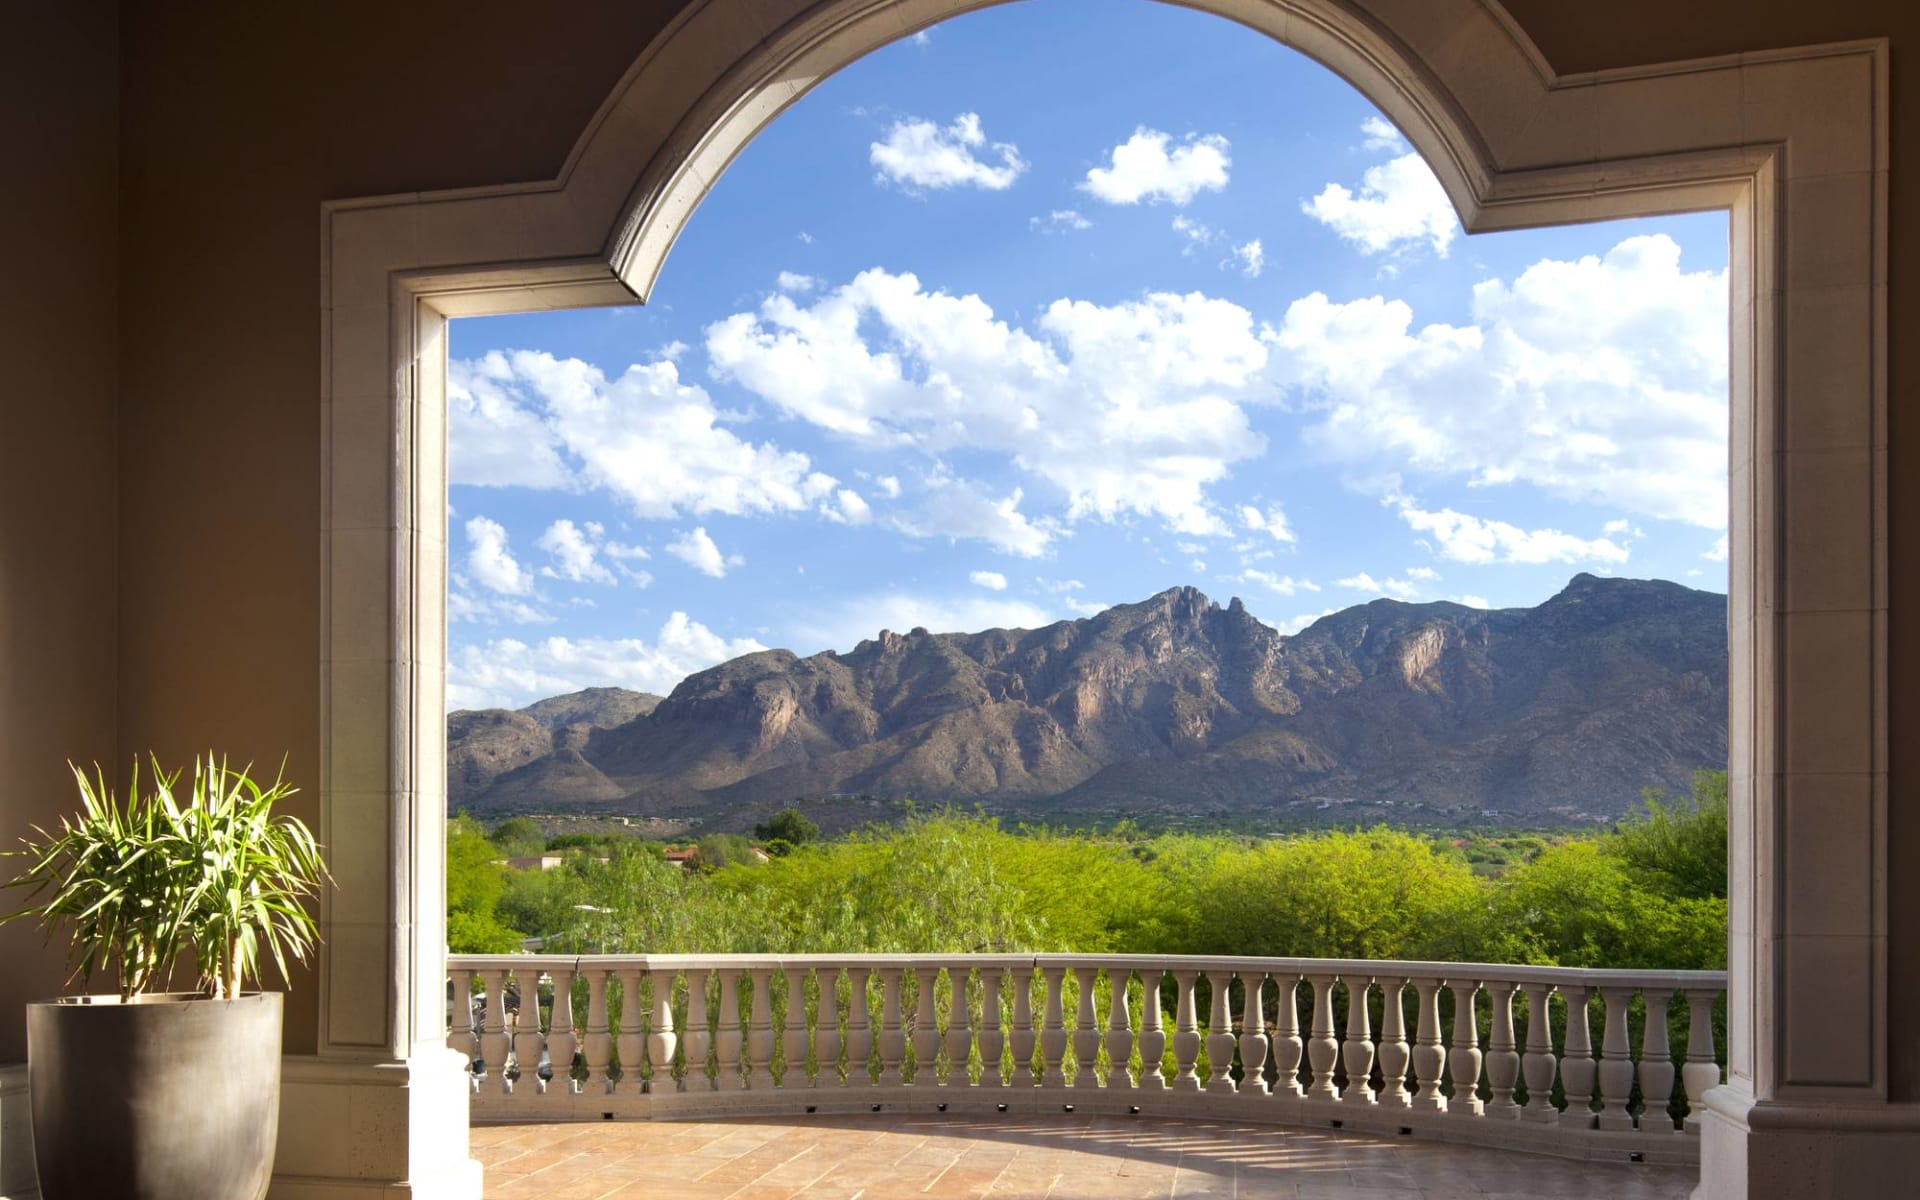 The Westin La Paloma Resort & Spa in Tucson: The Westin La Paloma Resort & Spa - Ausblick auf Berge